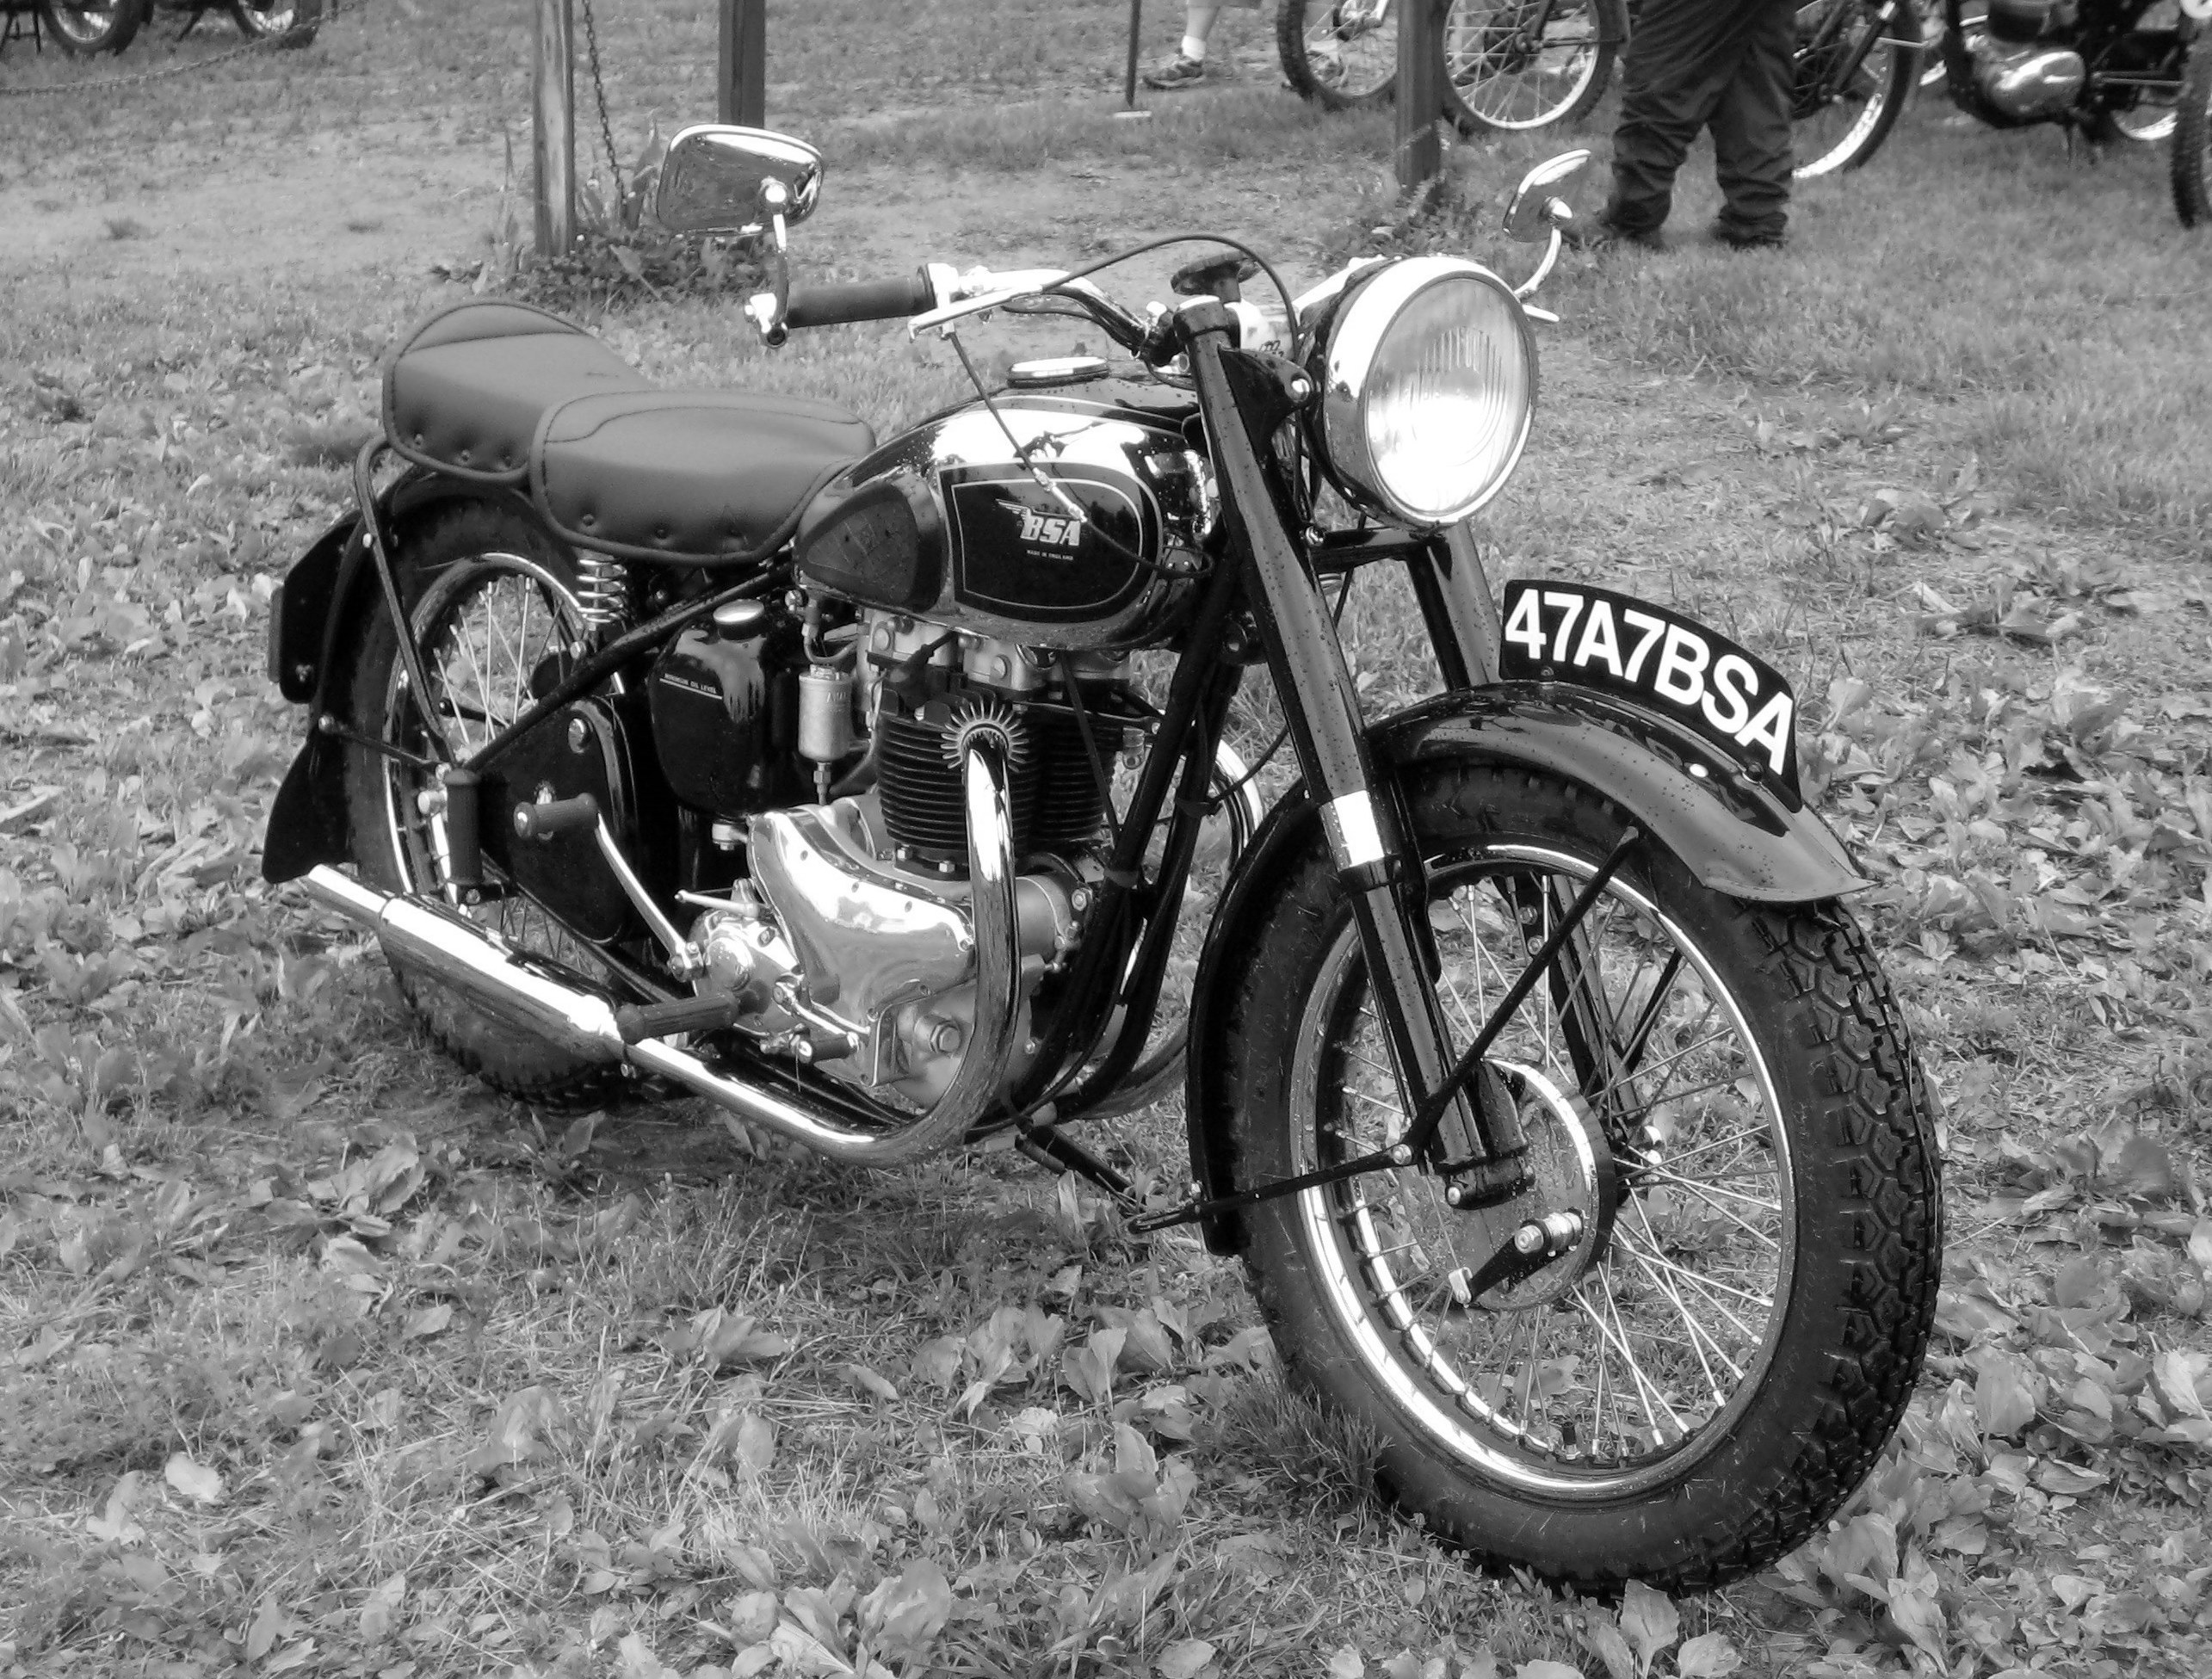 motorcycles british bsa motorcycle classic european antique retro bikes motorbikes harley planet biker pop davidson cycles motorbike retropopplanet swift custom